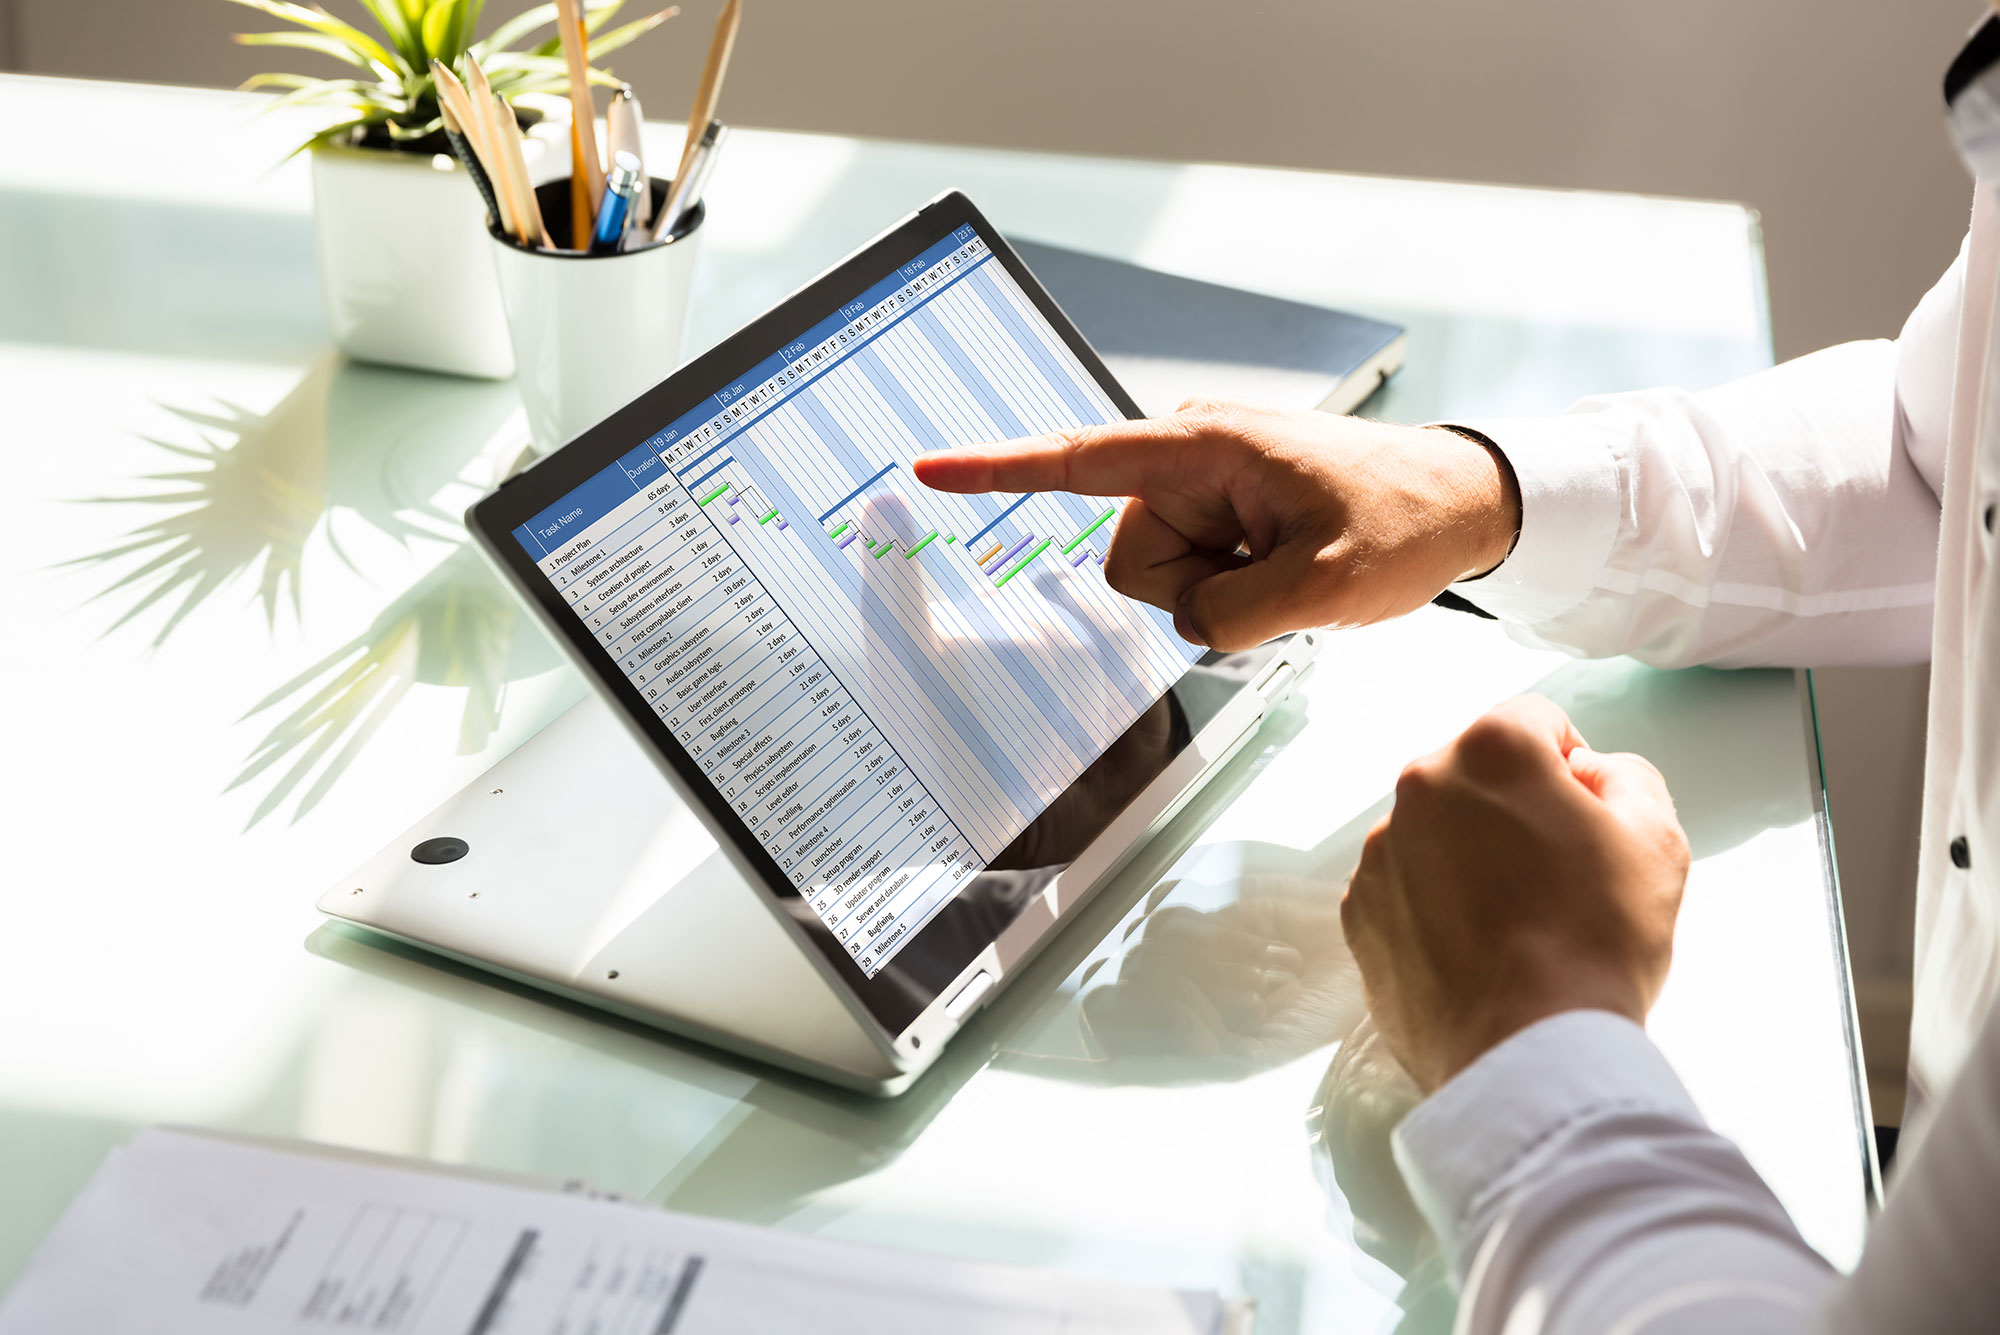 WBI-Wissensmanagement-fuer-Finanzen-Controlling2